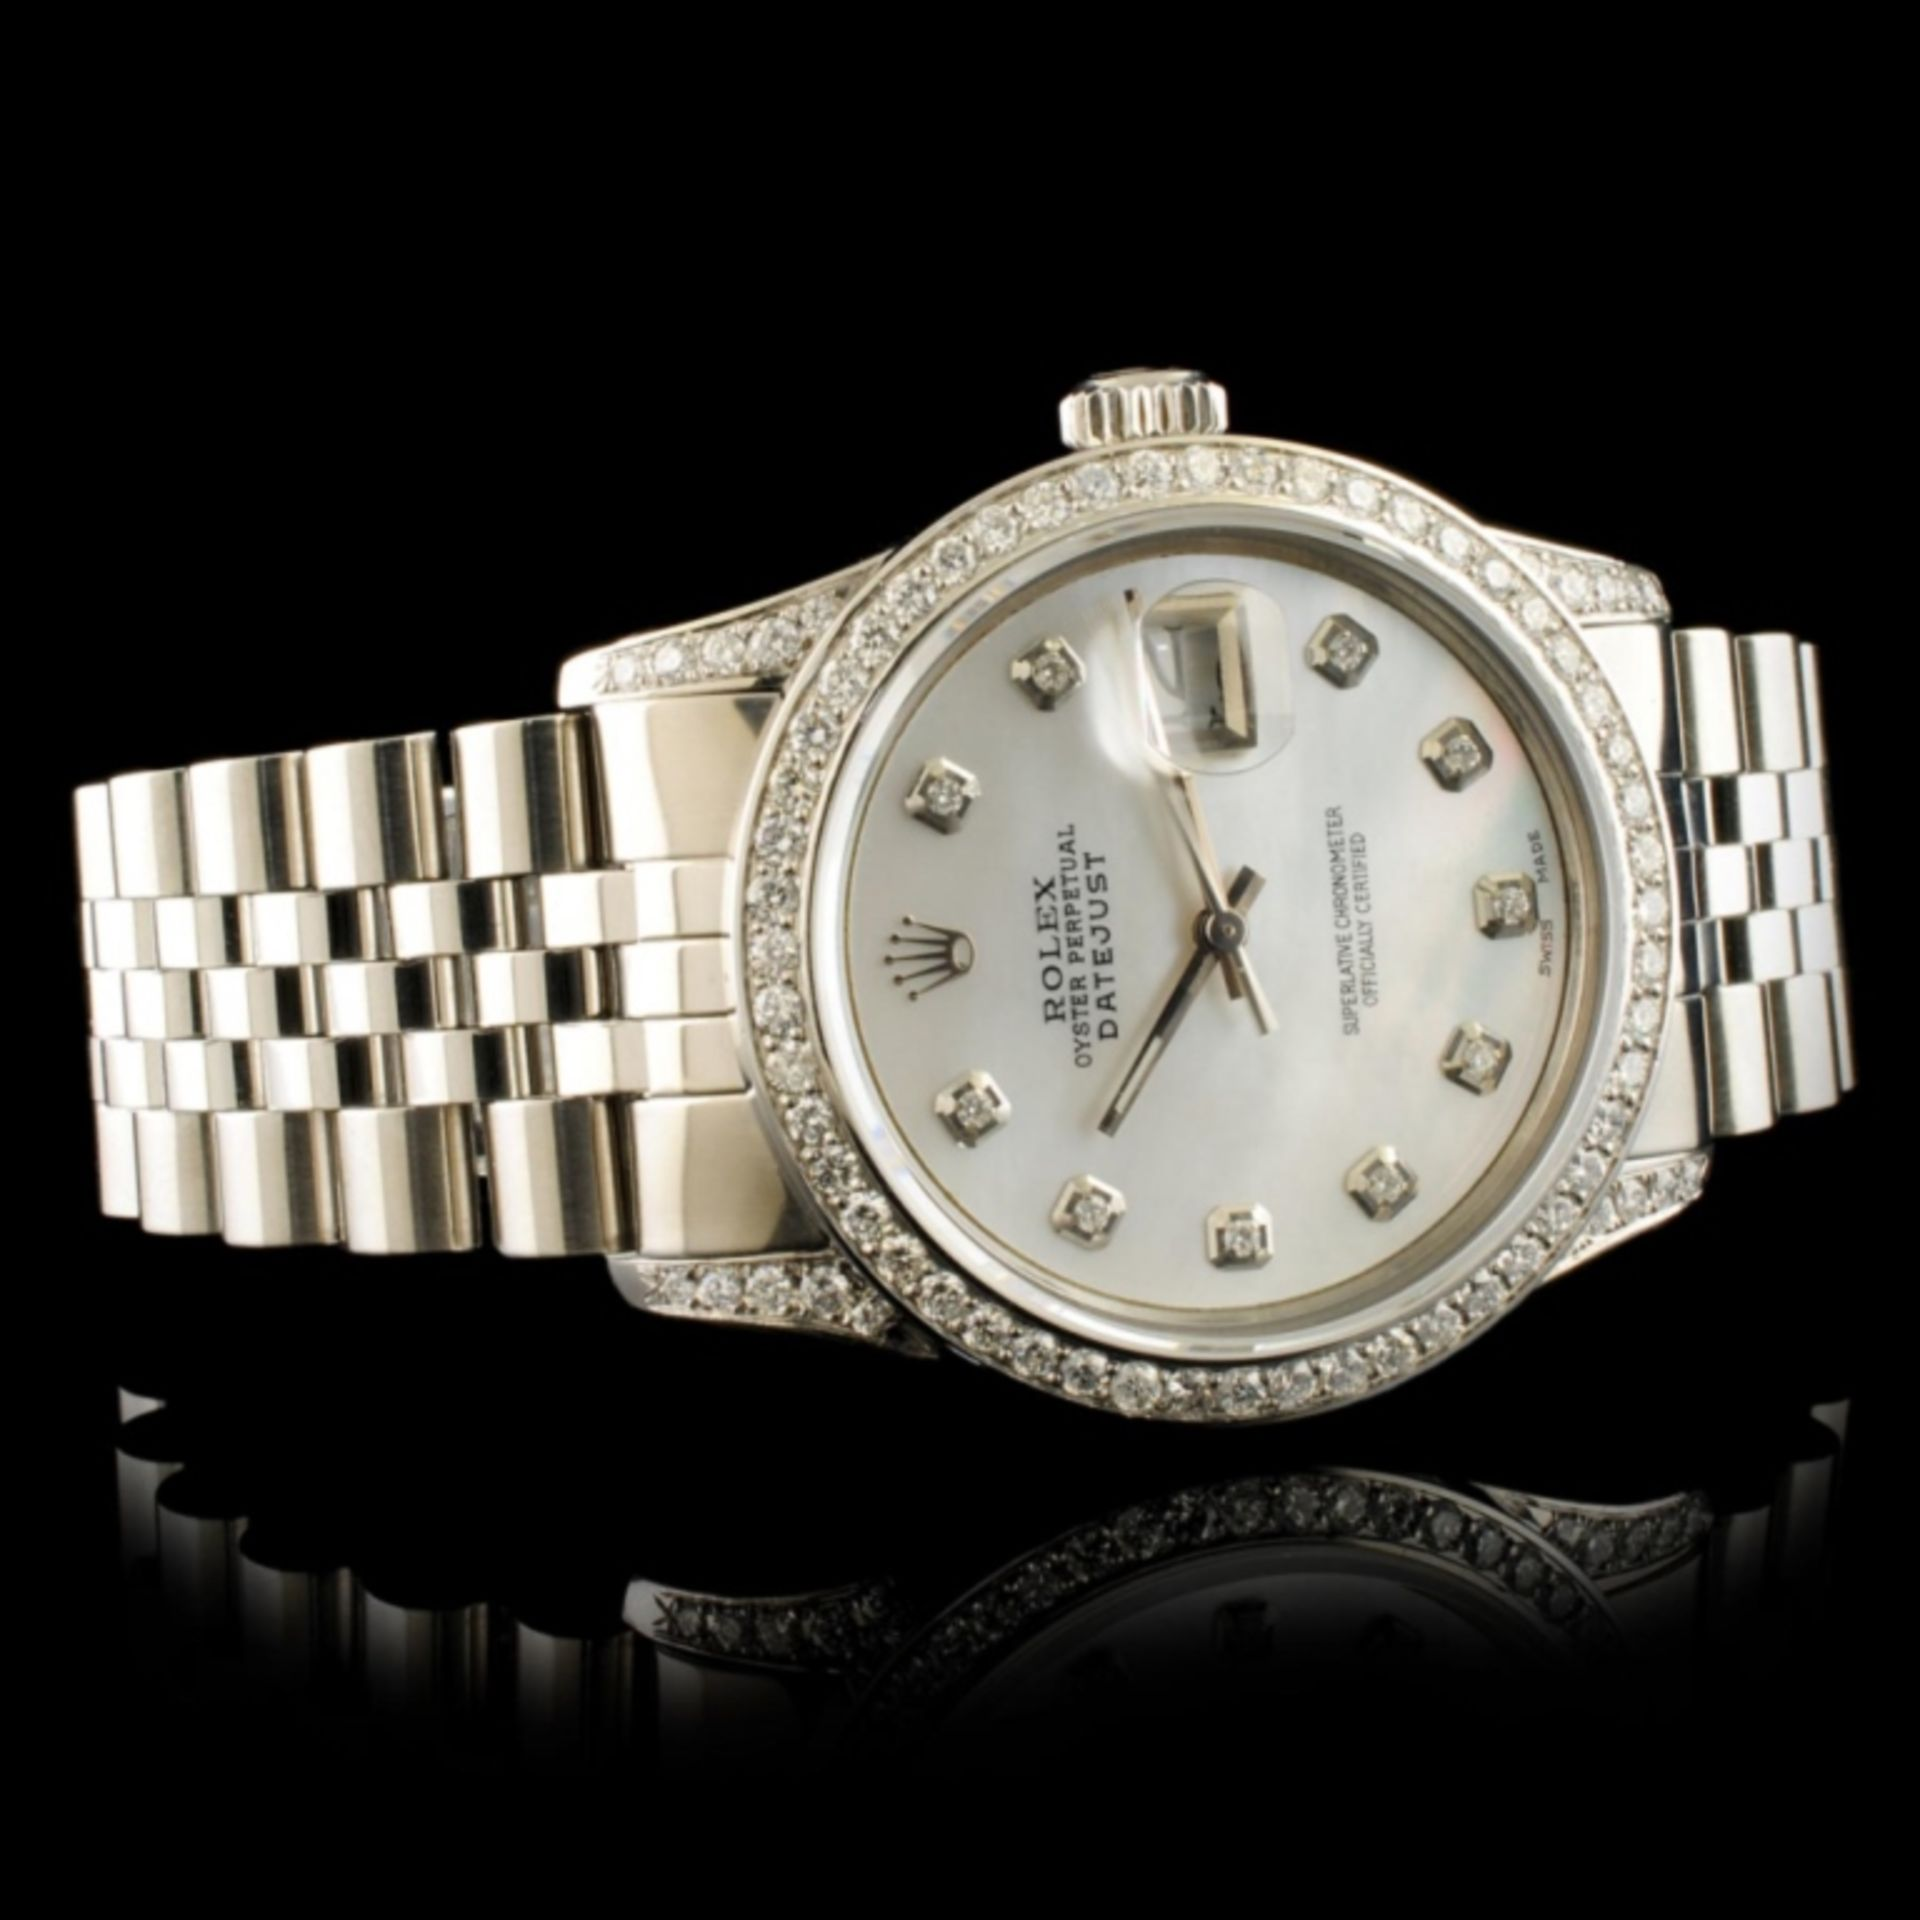 Rolex DateJust 1.50ctw Diamond 36MM Wristwatch - Image 5 of 6